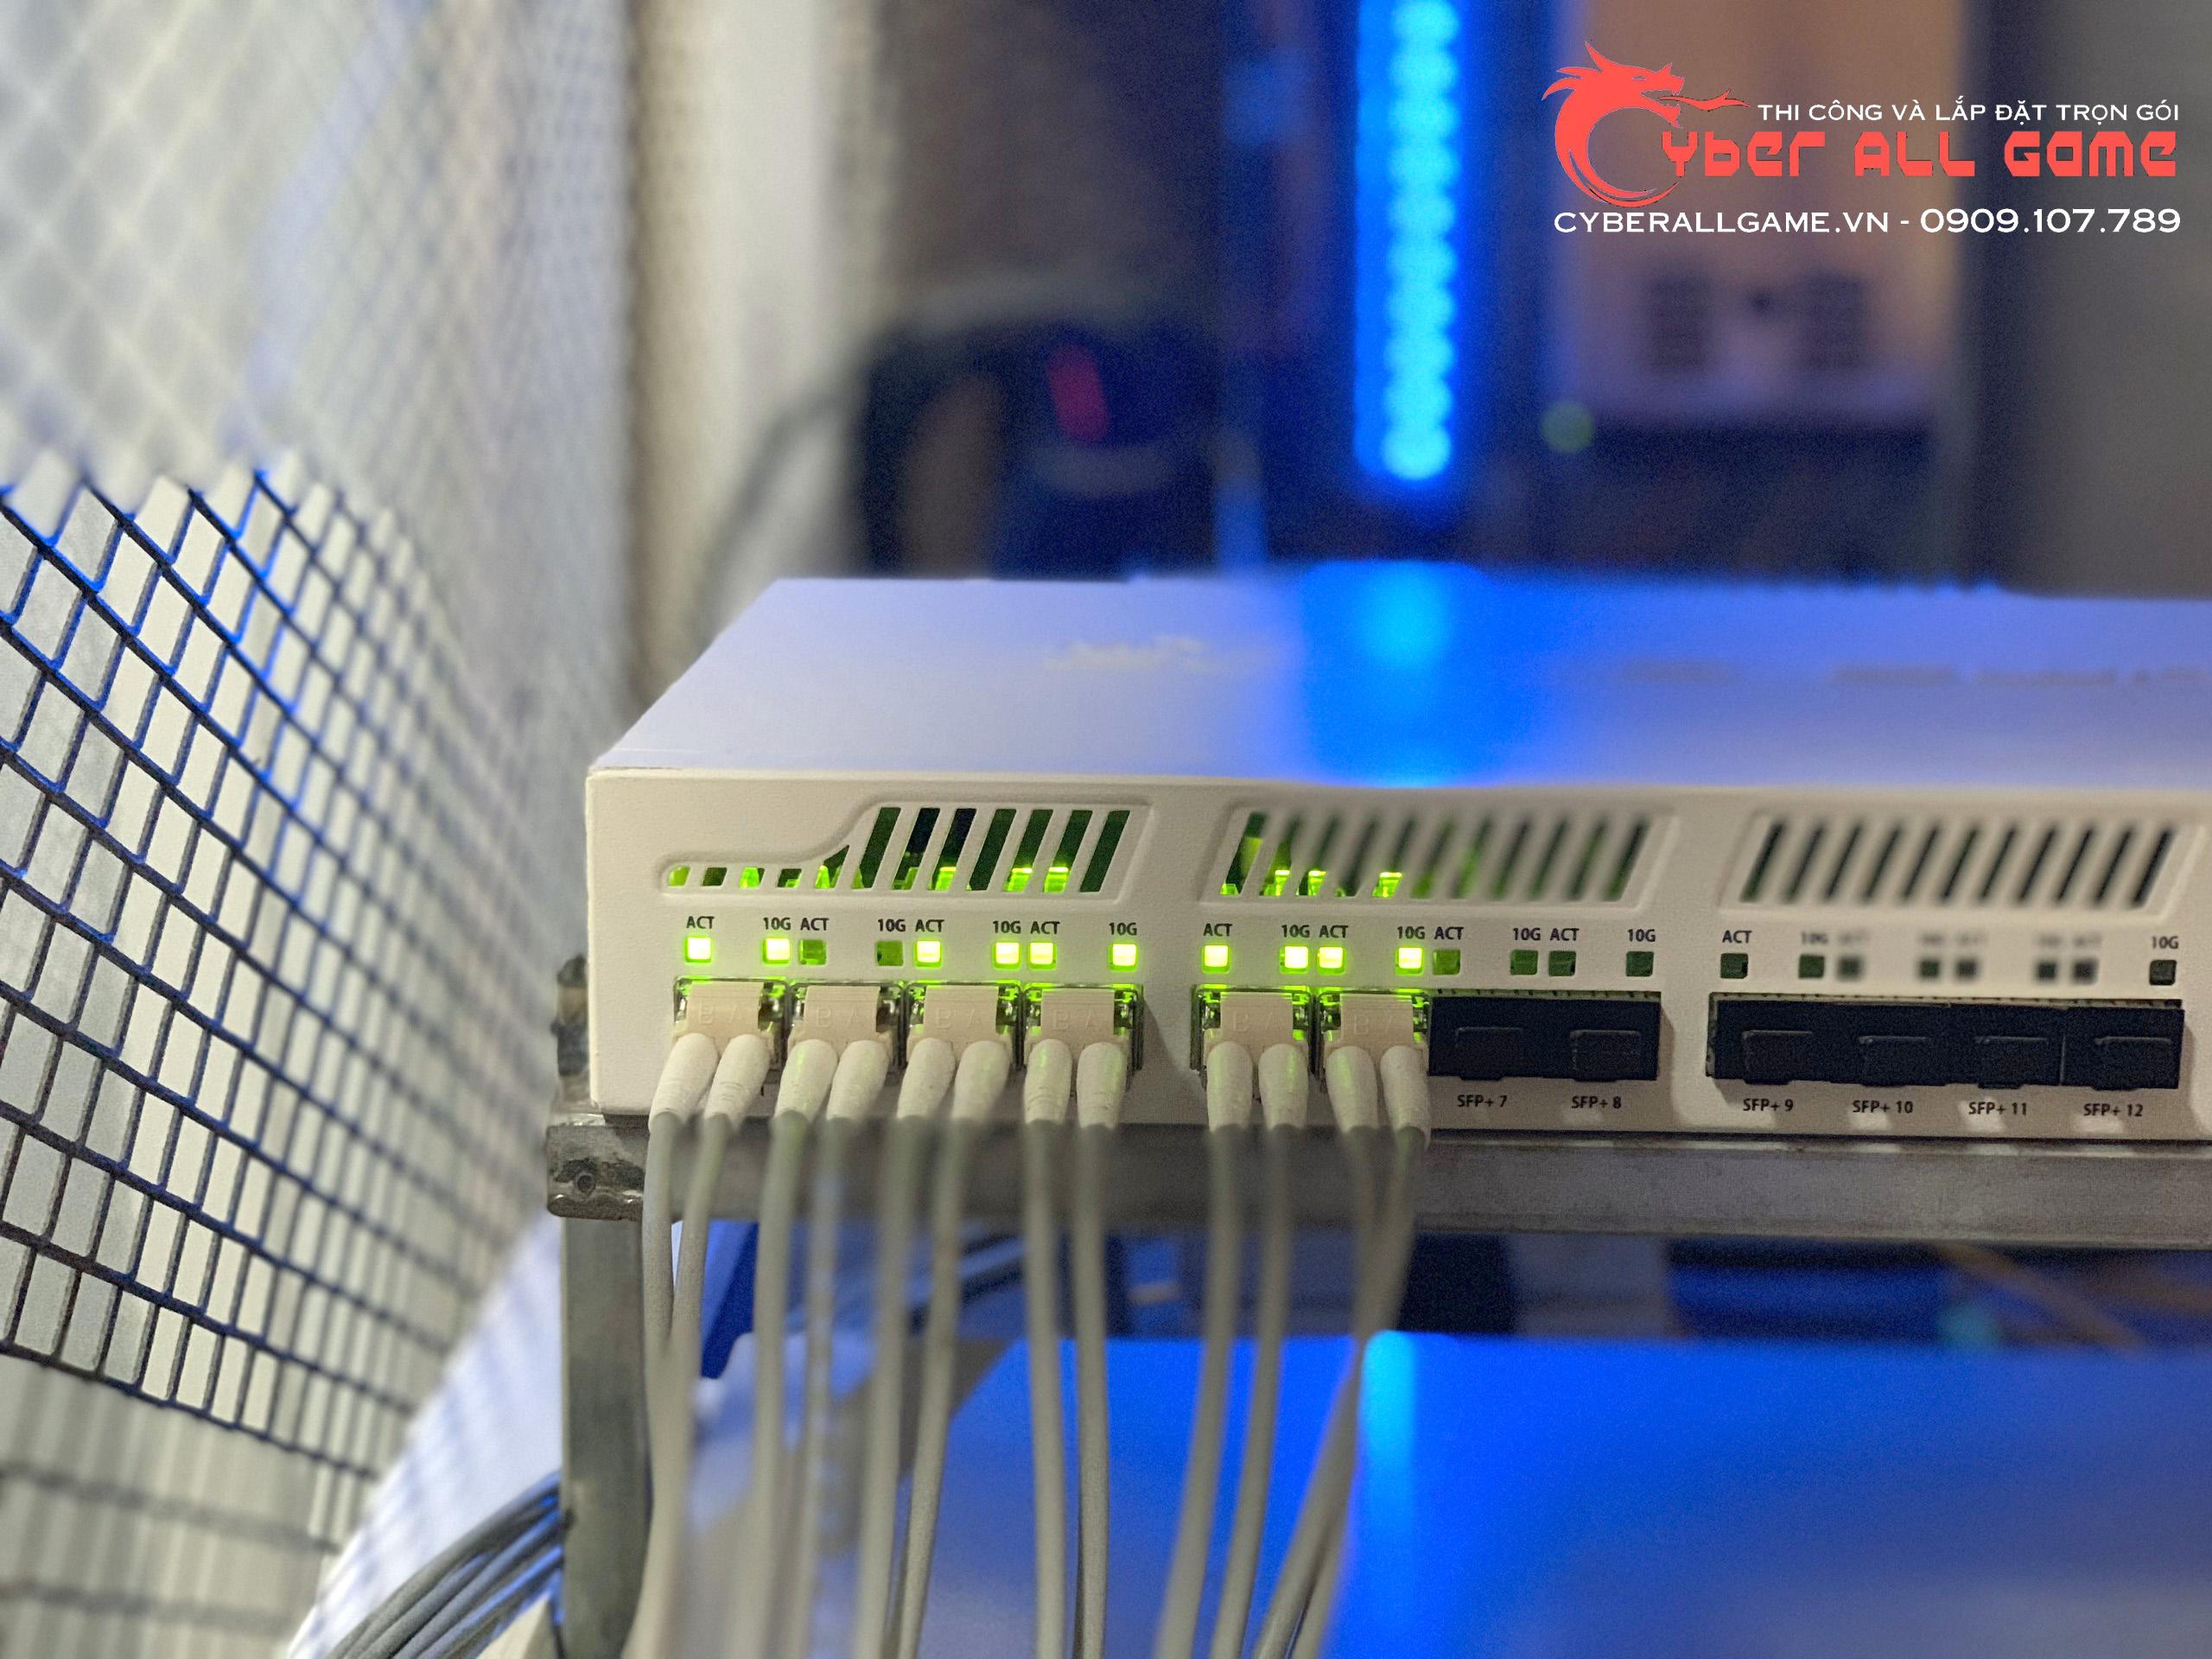 Switch quang học 20gb cho cyber game